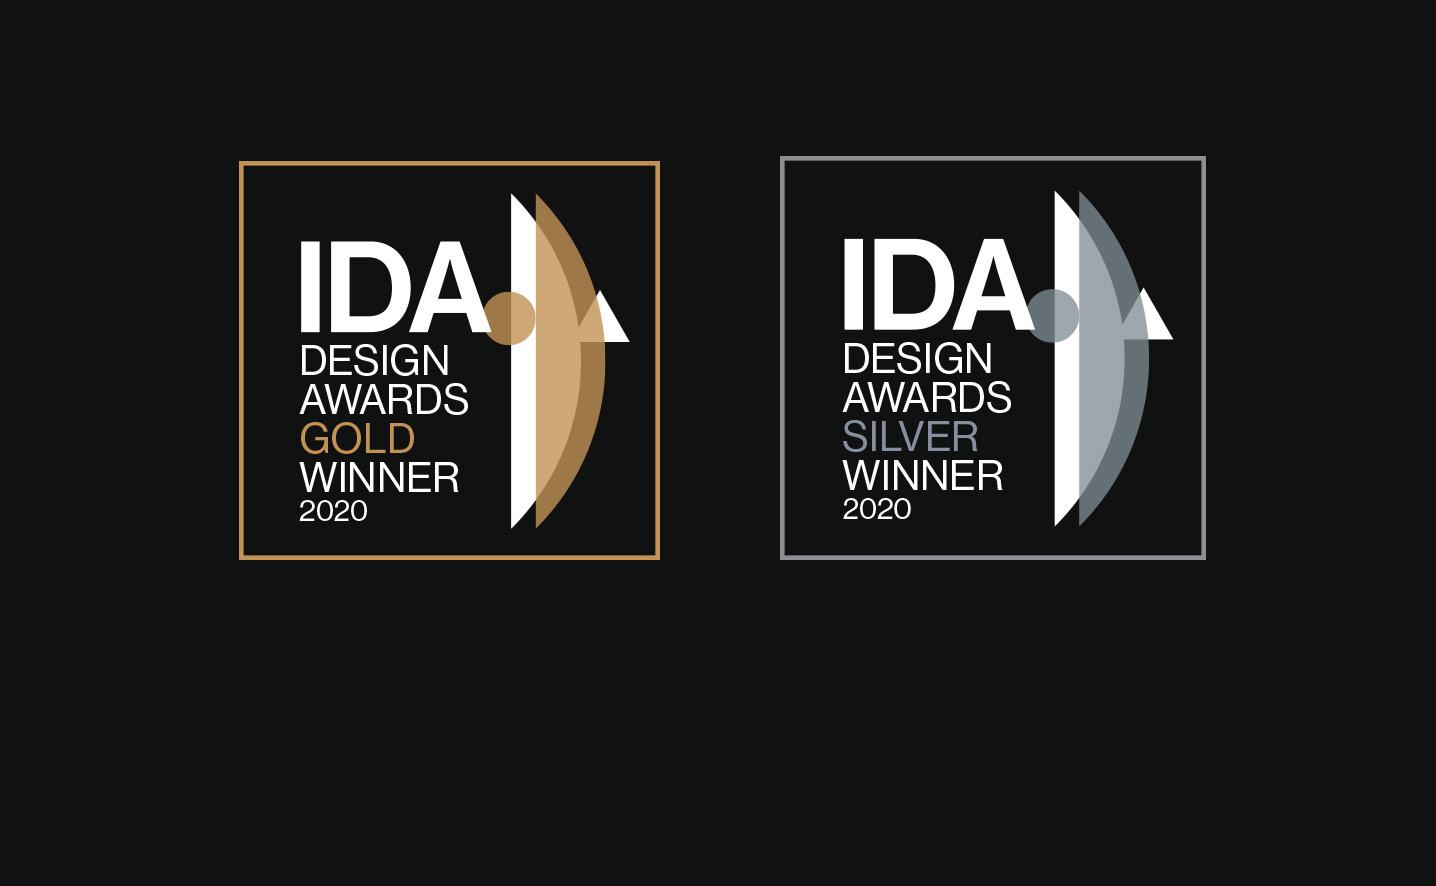 IDA-Design_Awards-Better_Origin-2020-1